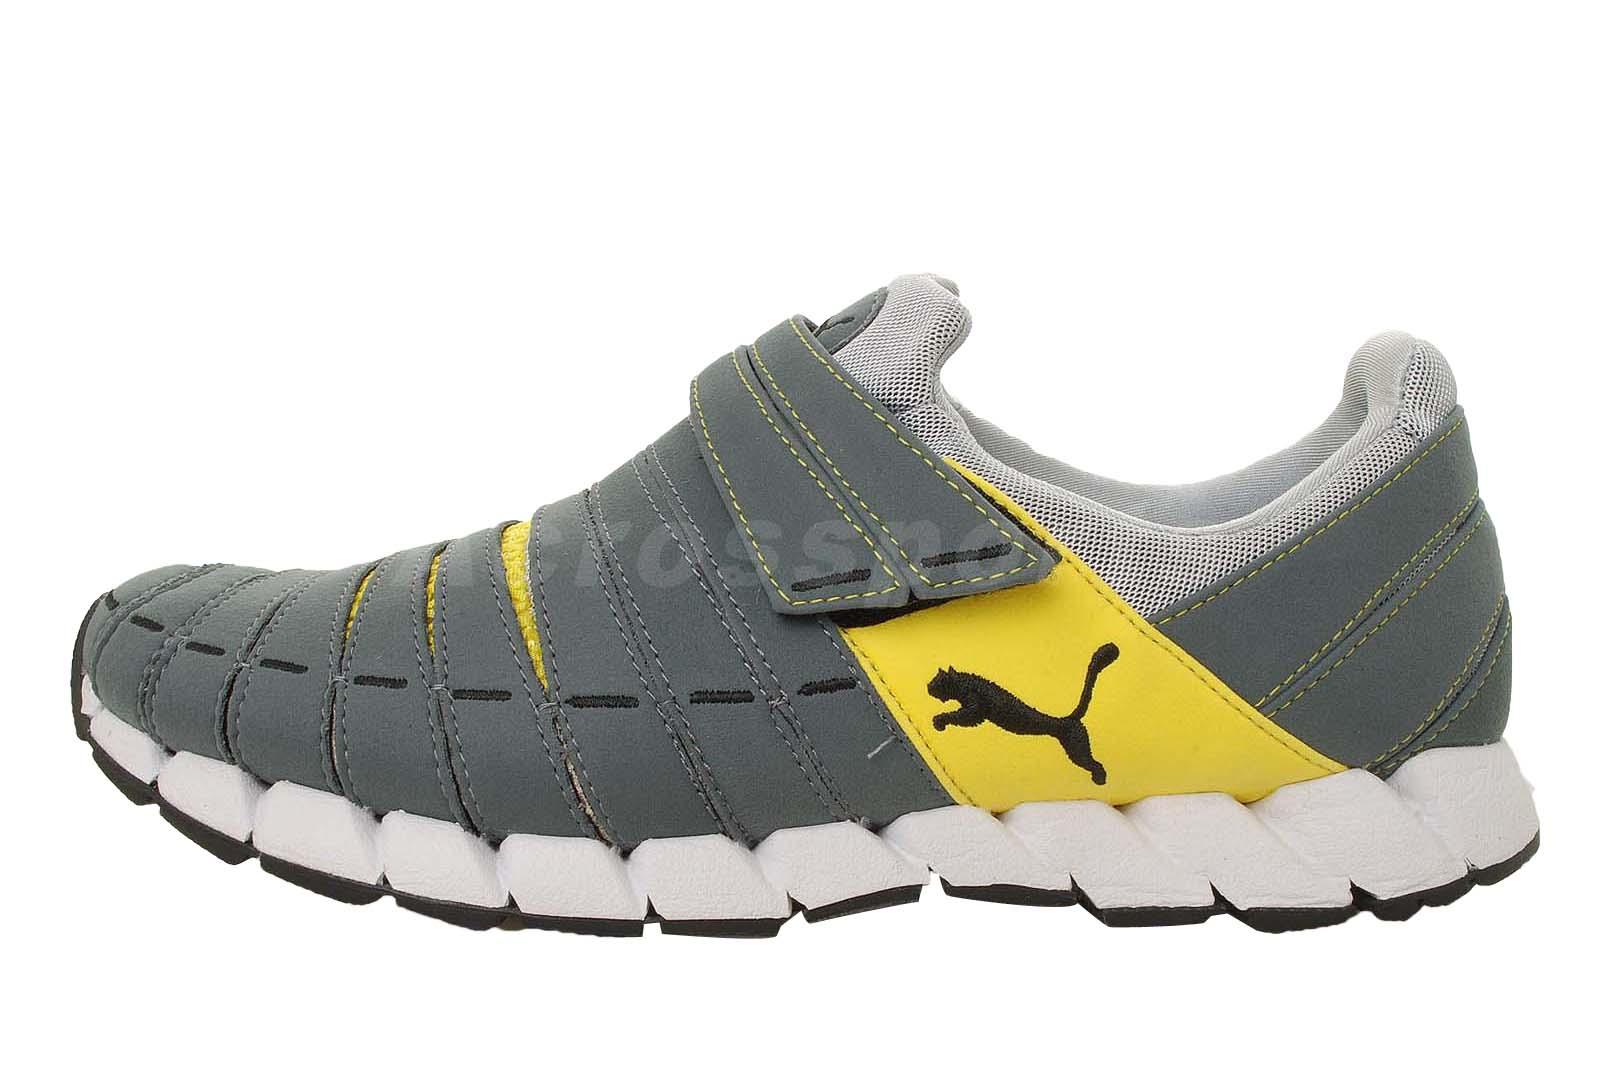 Puma Osu NM Dark Grey Yellow Velcro Mens Running Shoes ...